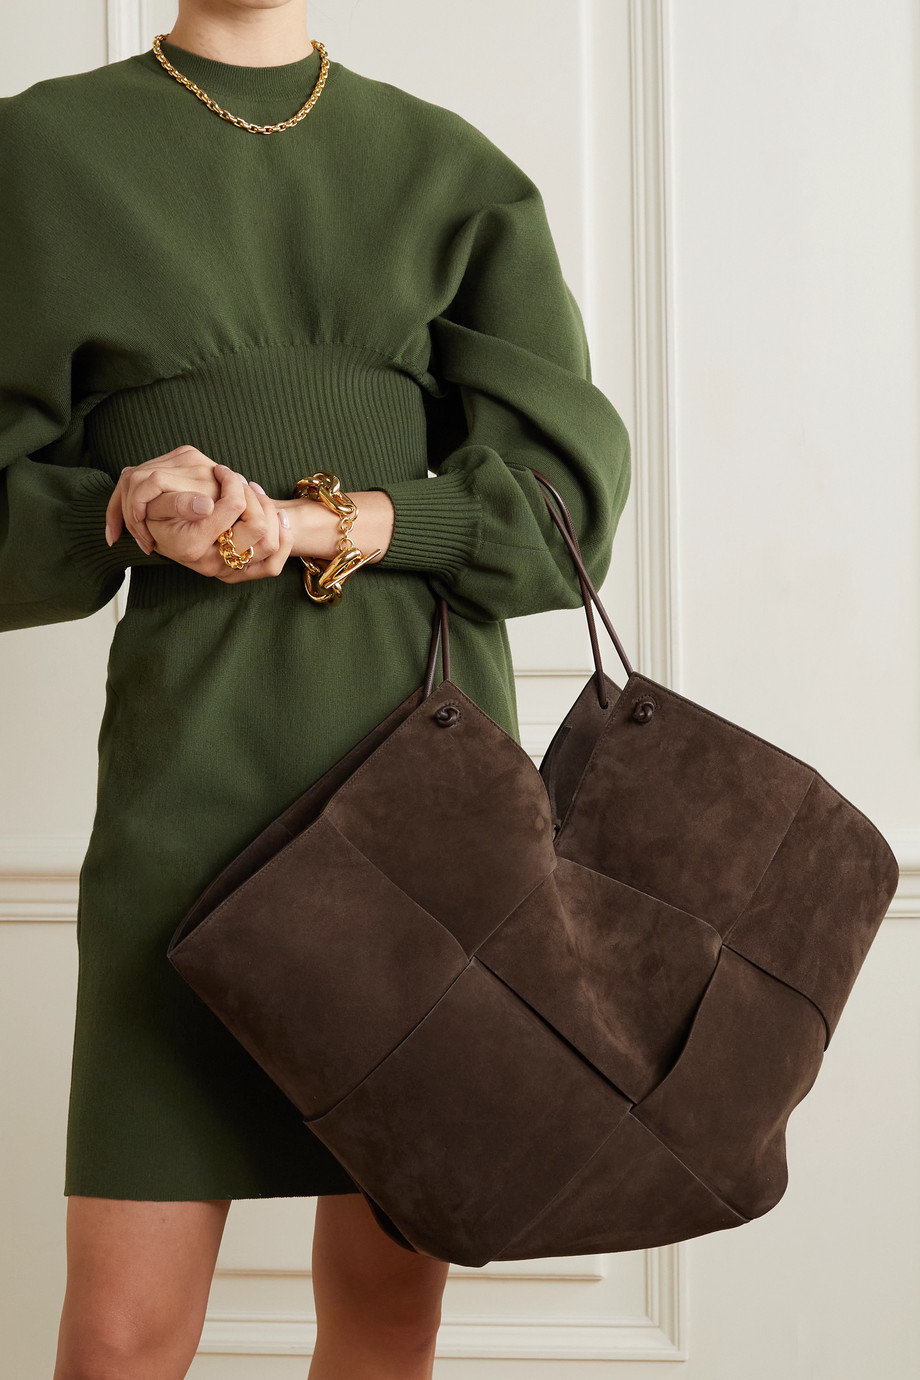 Bottega Veneta Flower Basket large intrecciato suede and leather tote